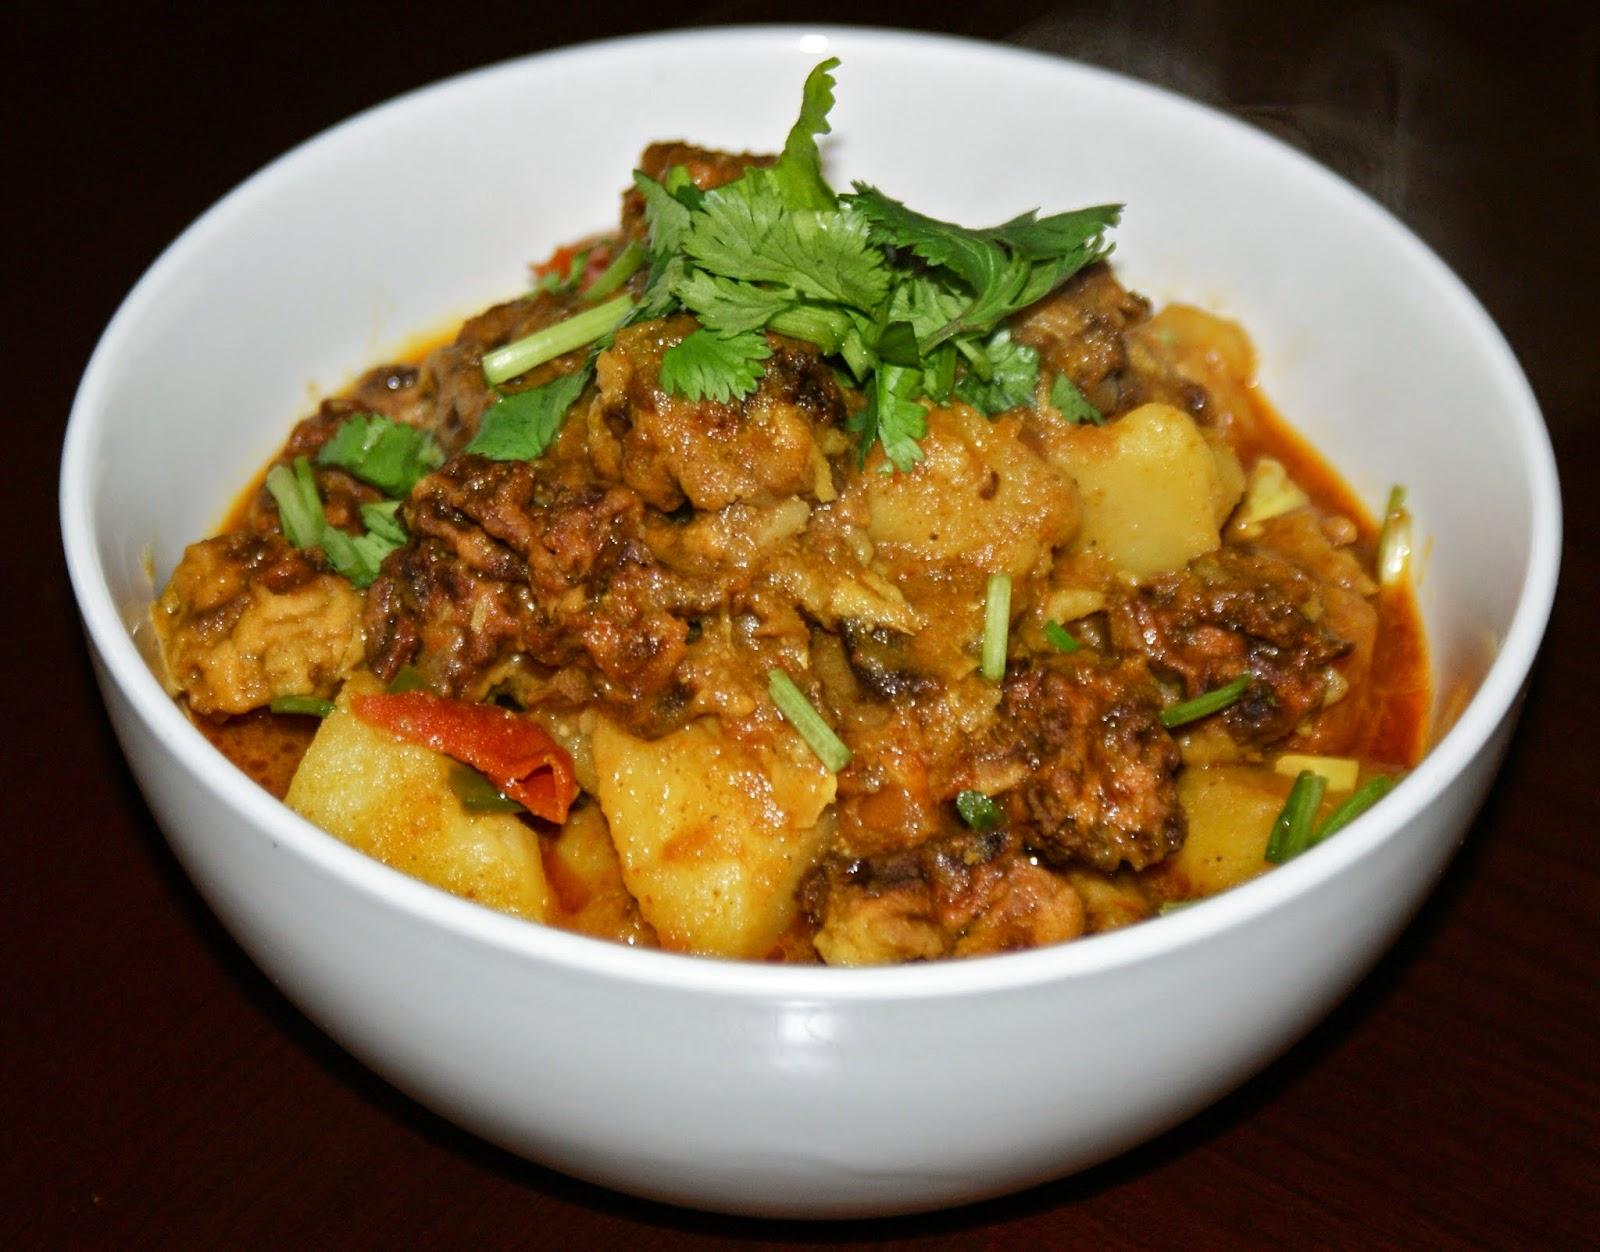 Nepali Tummy!!: Masaura (Sun-dried Vegetable Balls) Curry